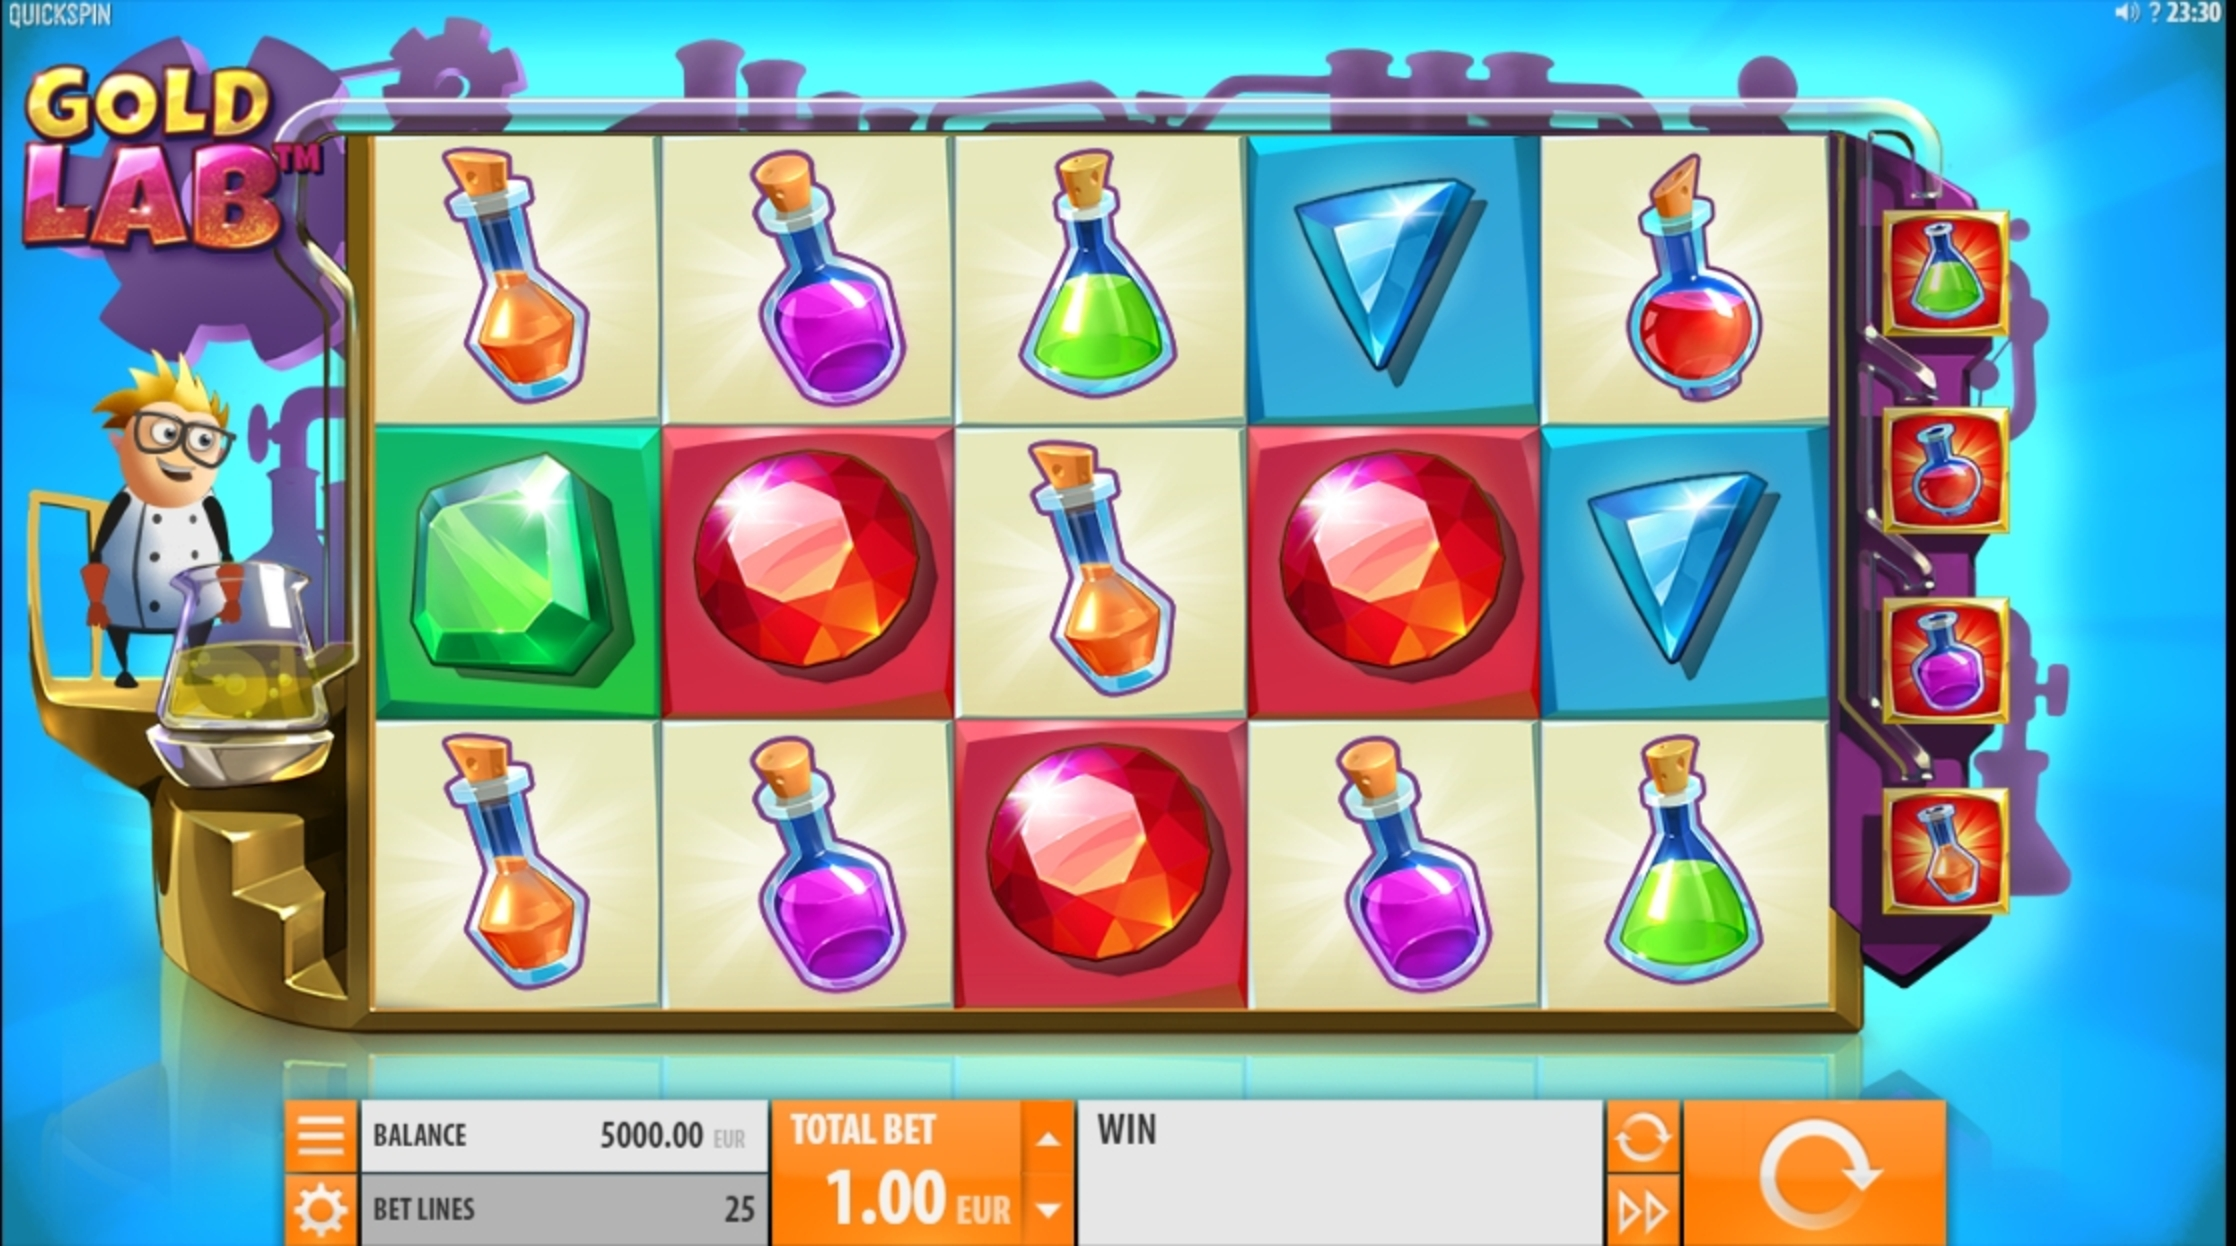 The Lab Slot Machine